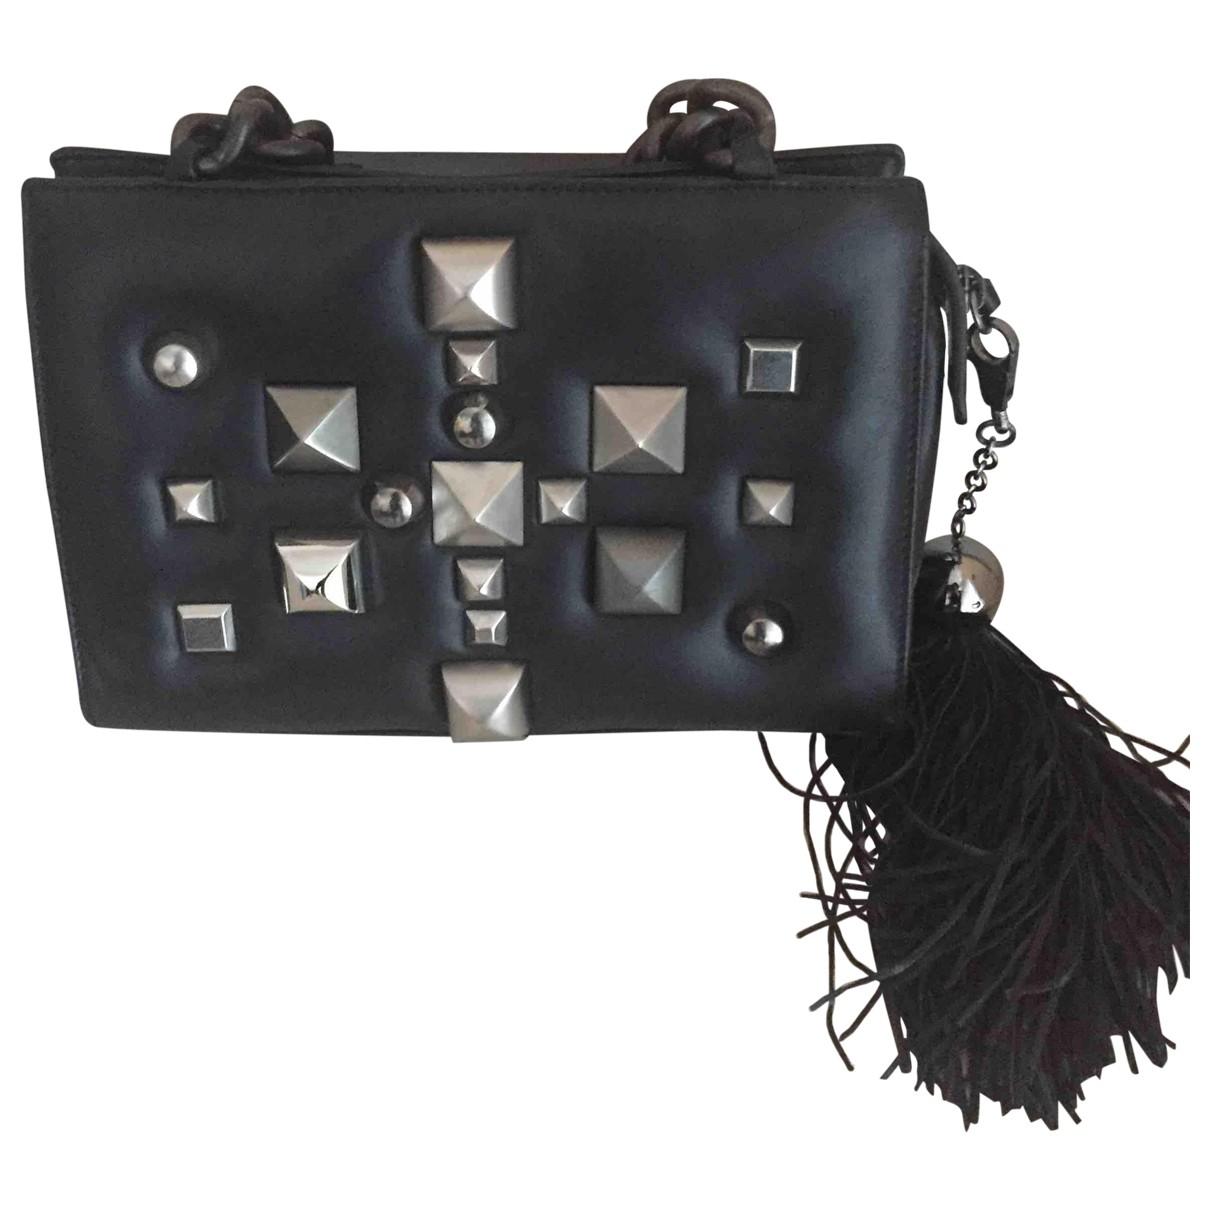 Roberto Cavalli \N Black Leather handbag for Women \N